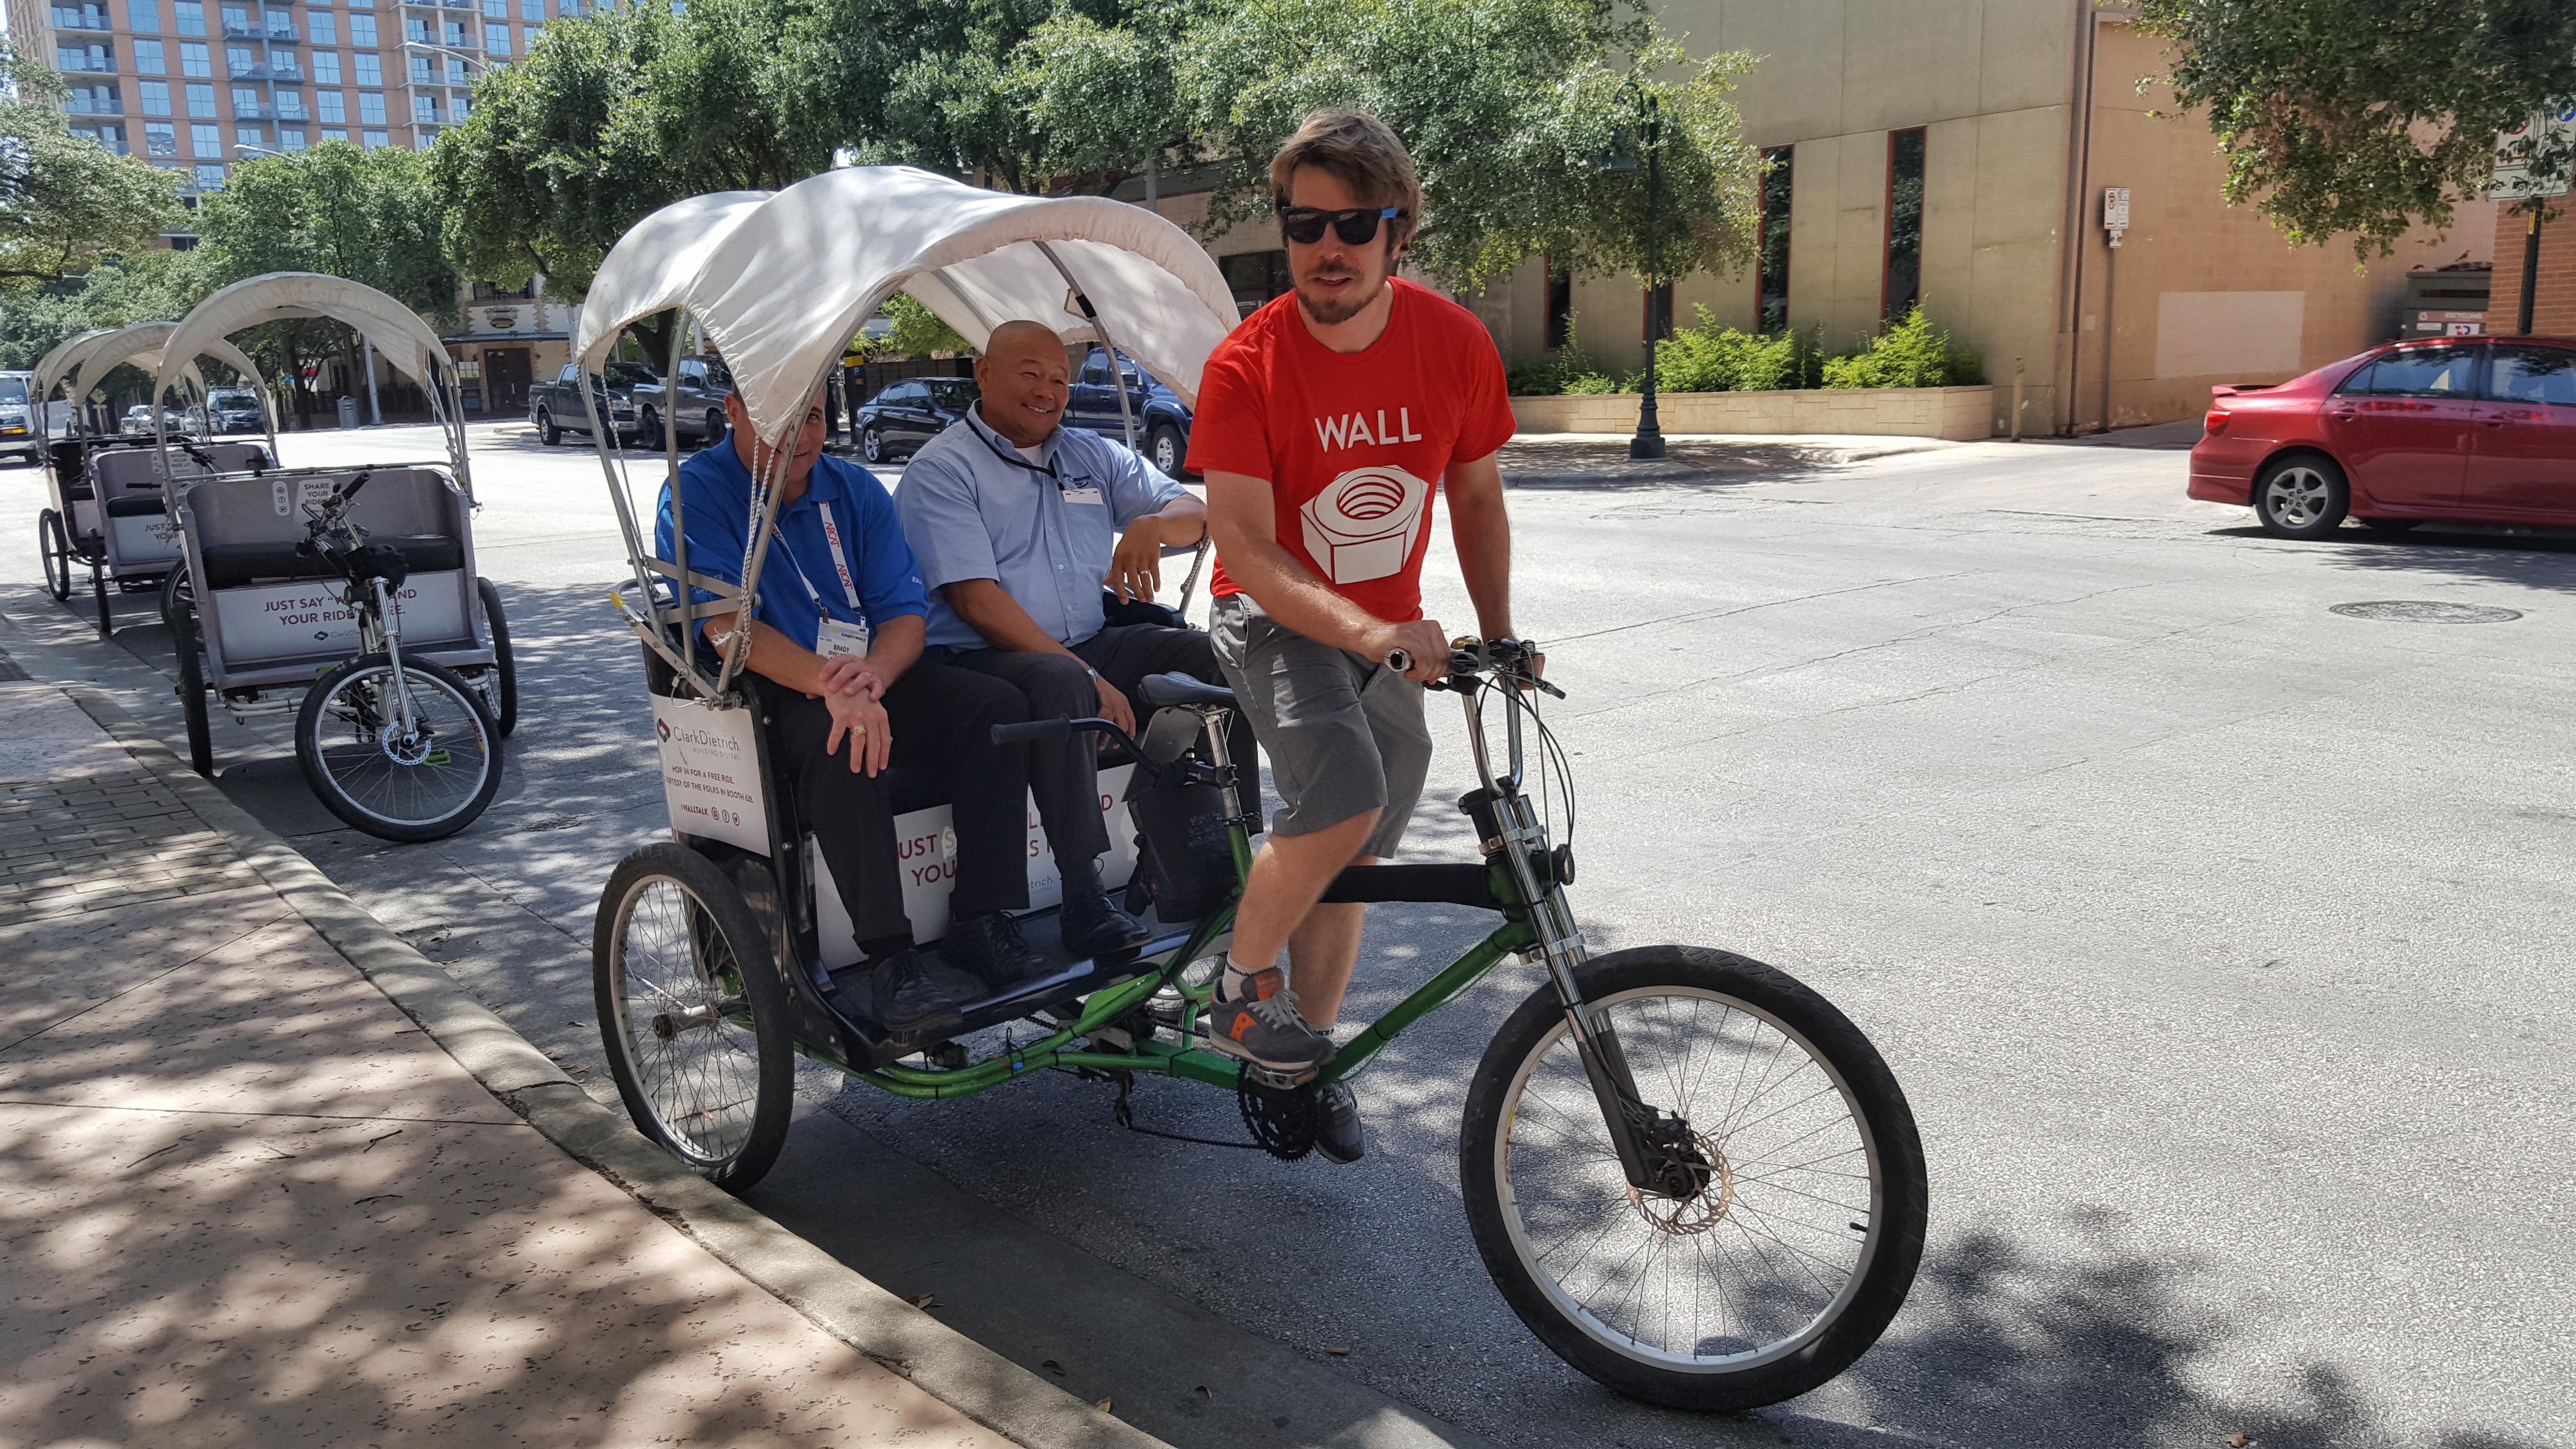 pedicab advertising glossary movemint bike cab. Black Bedroom Furniture Sets. Home Design Ideas